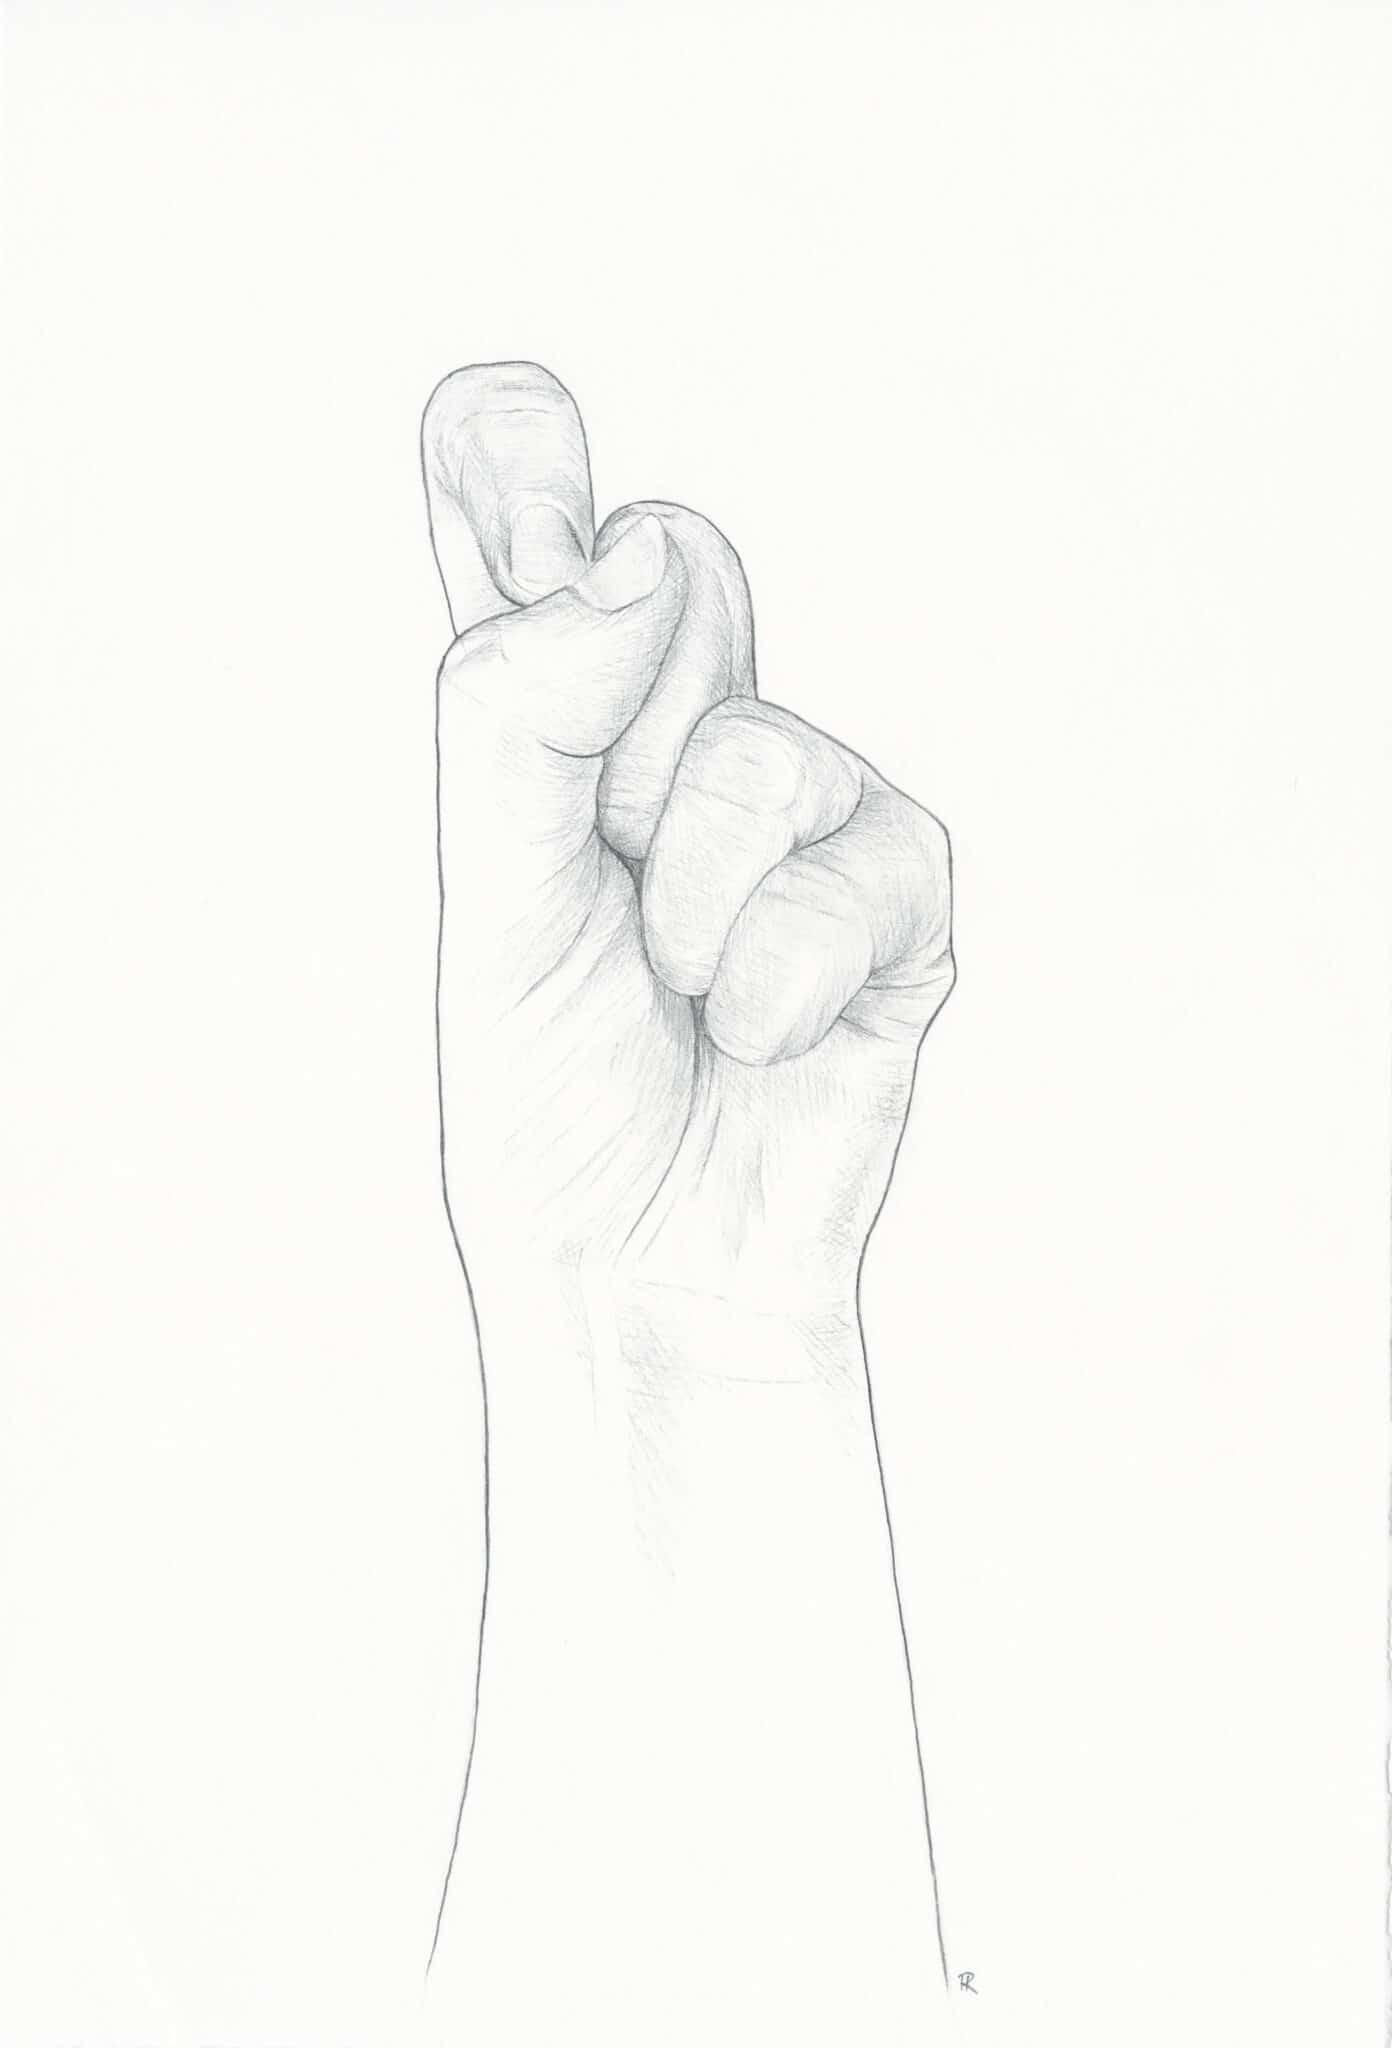 Breathe By Rebecca Pidgeon (Line Exhibition)